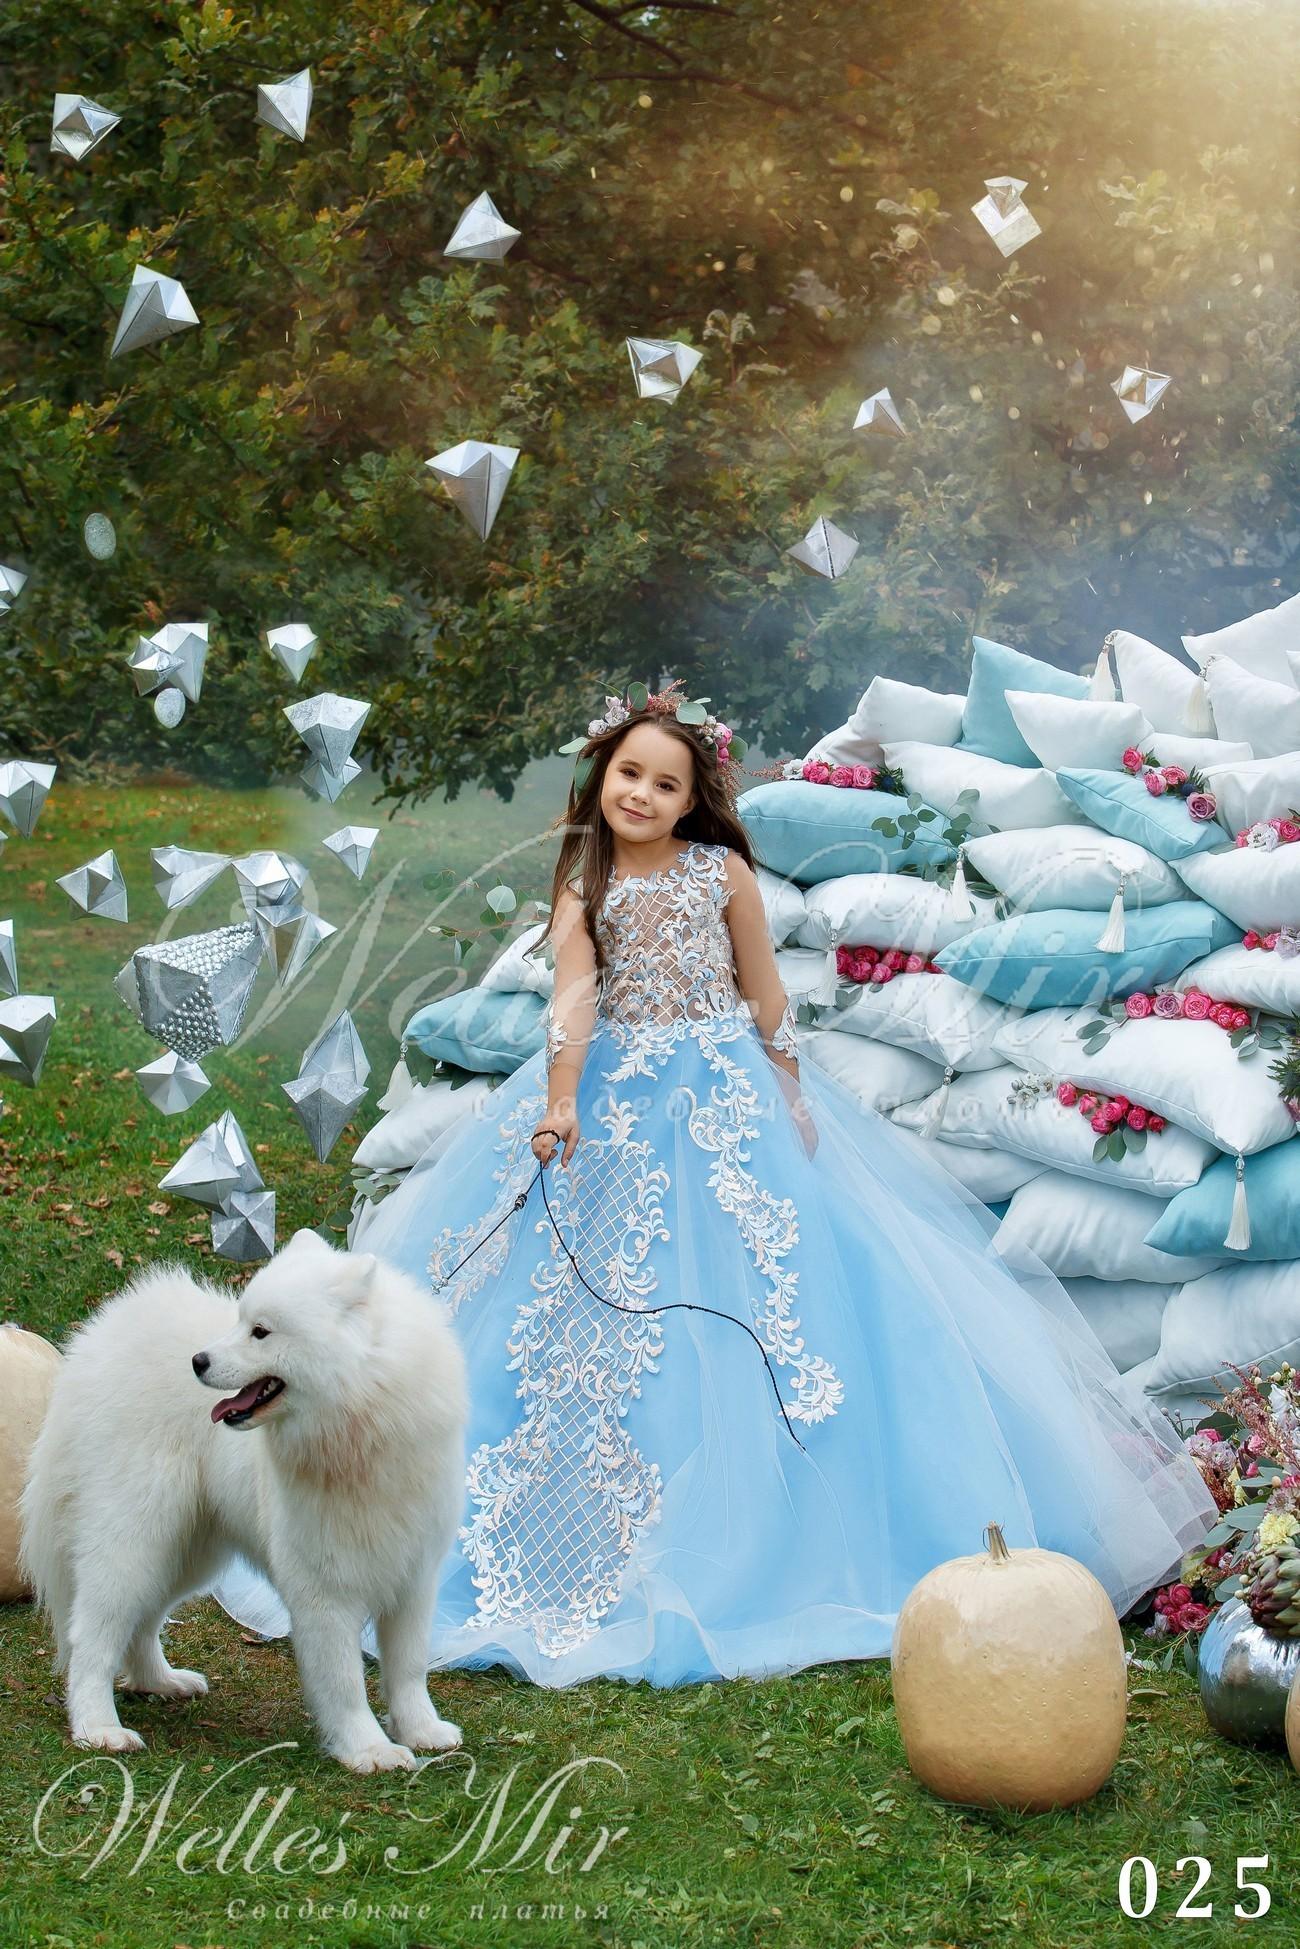 Дитячі сукні Kids Deluxe Collection 2018 - 025